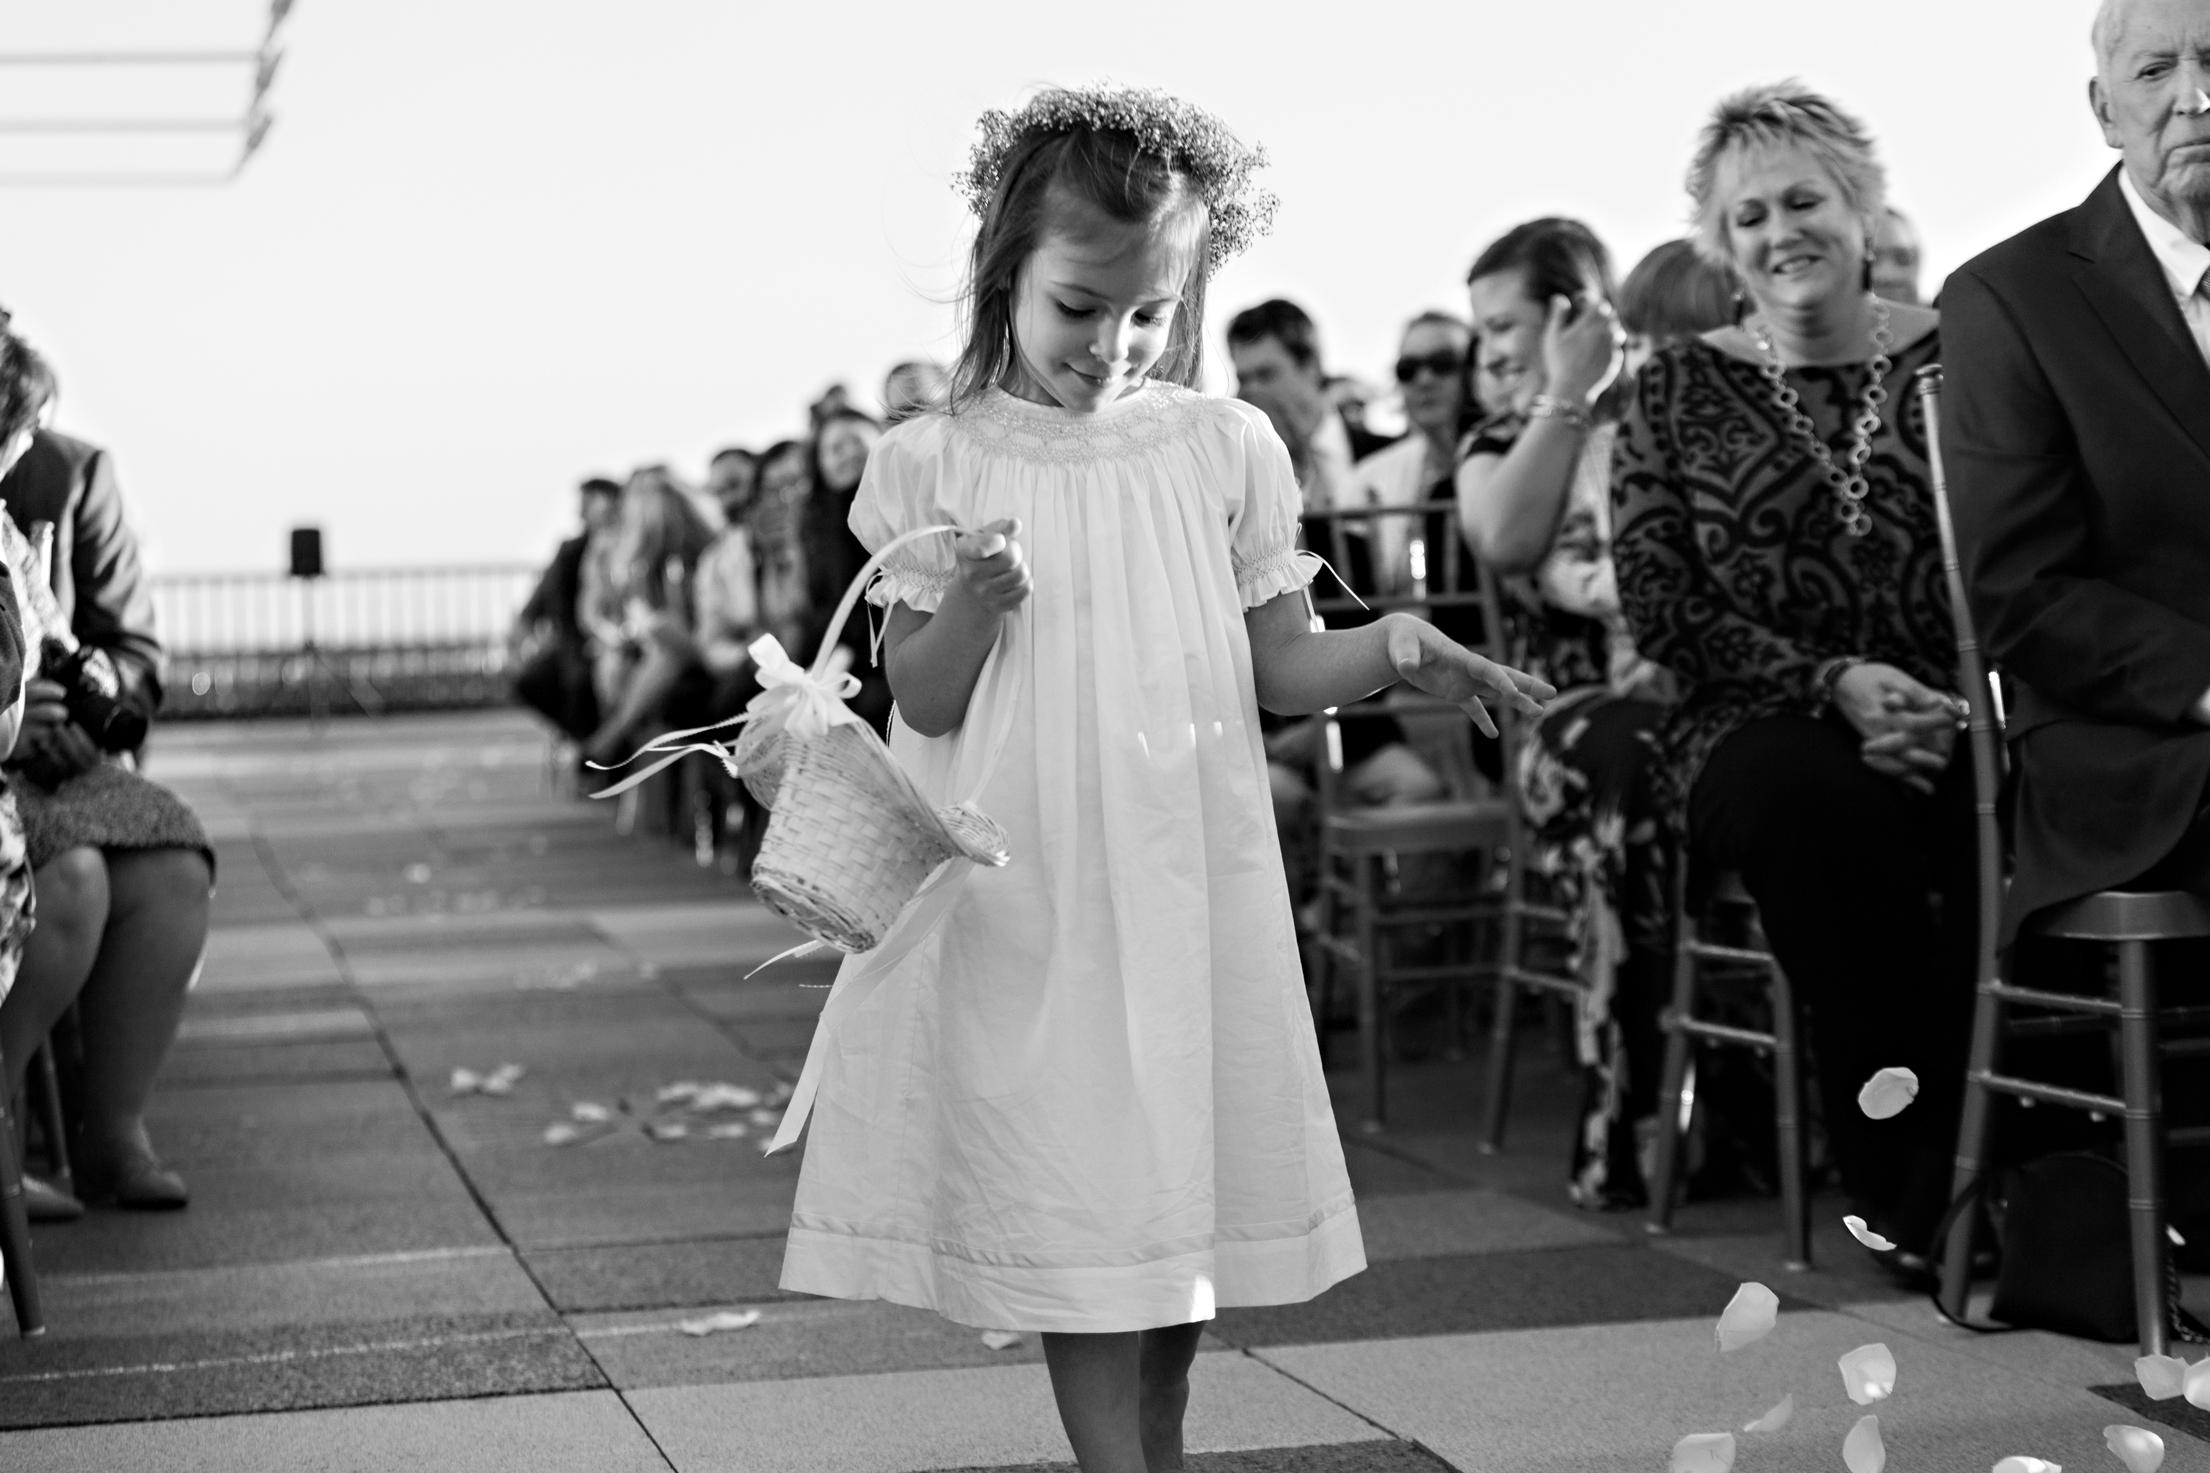 Matty-Drollette-Photography-Weddings-Montgomery-Alabama-124.jpg